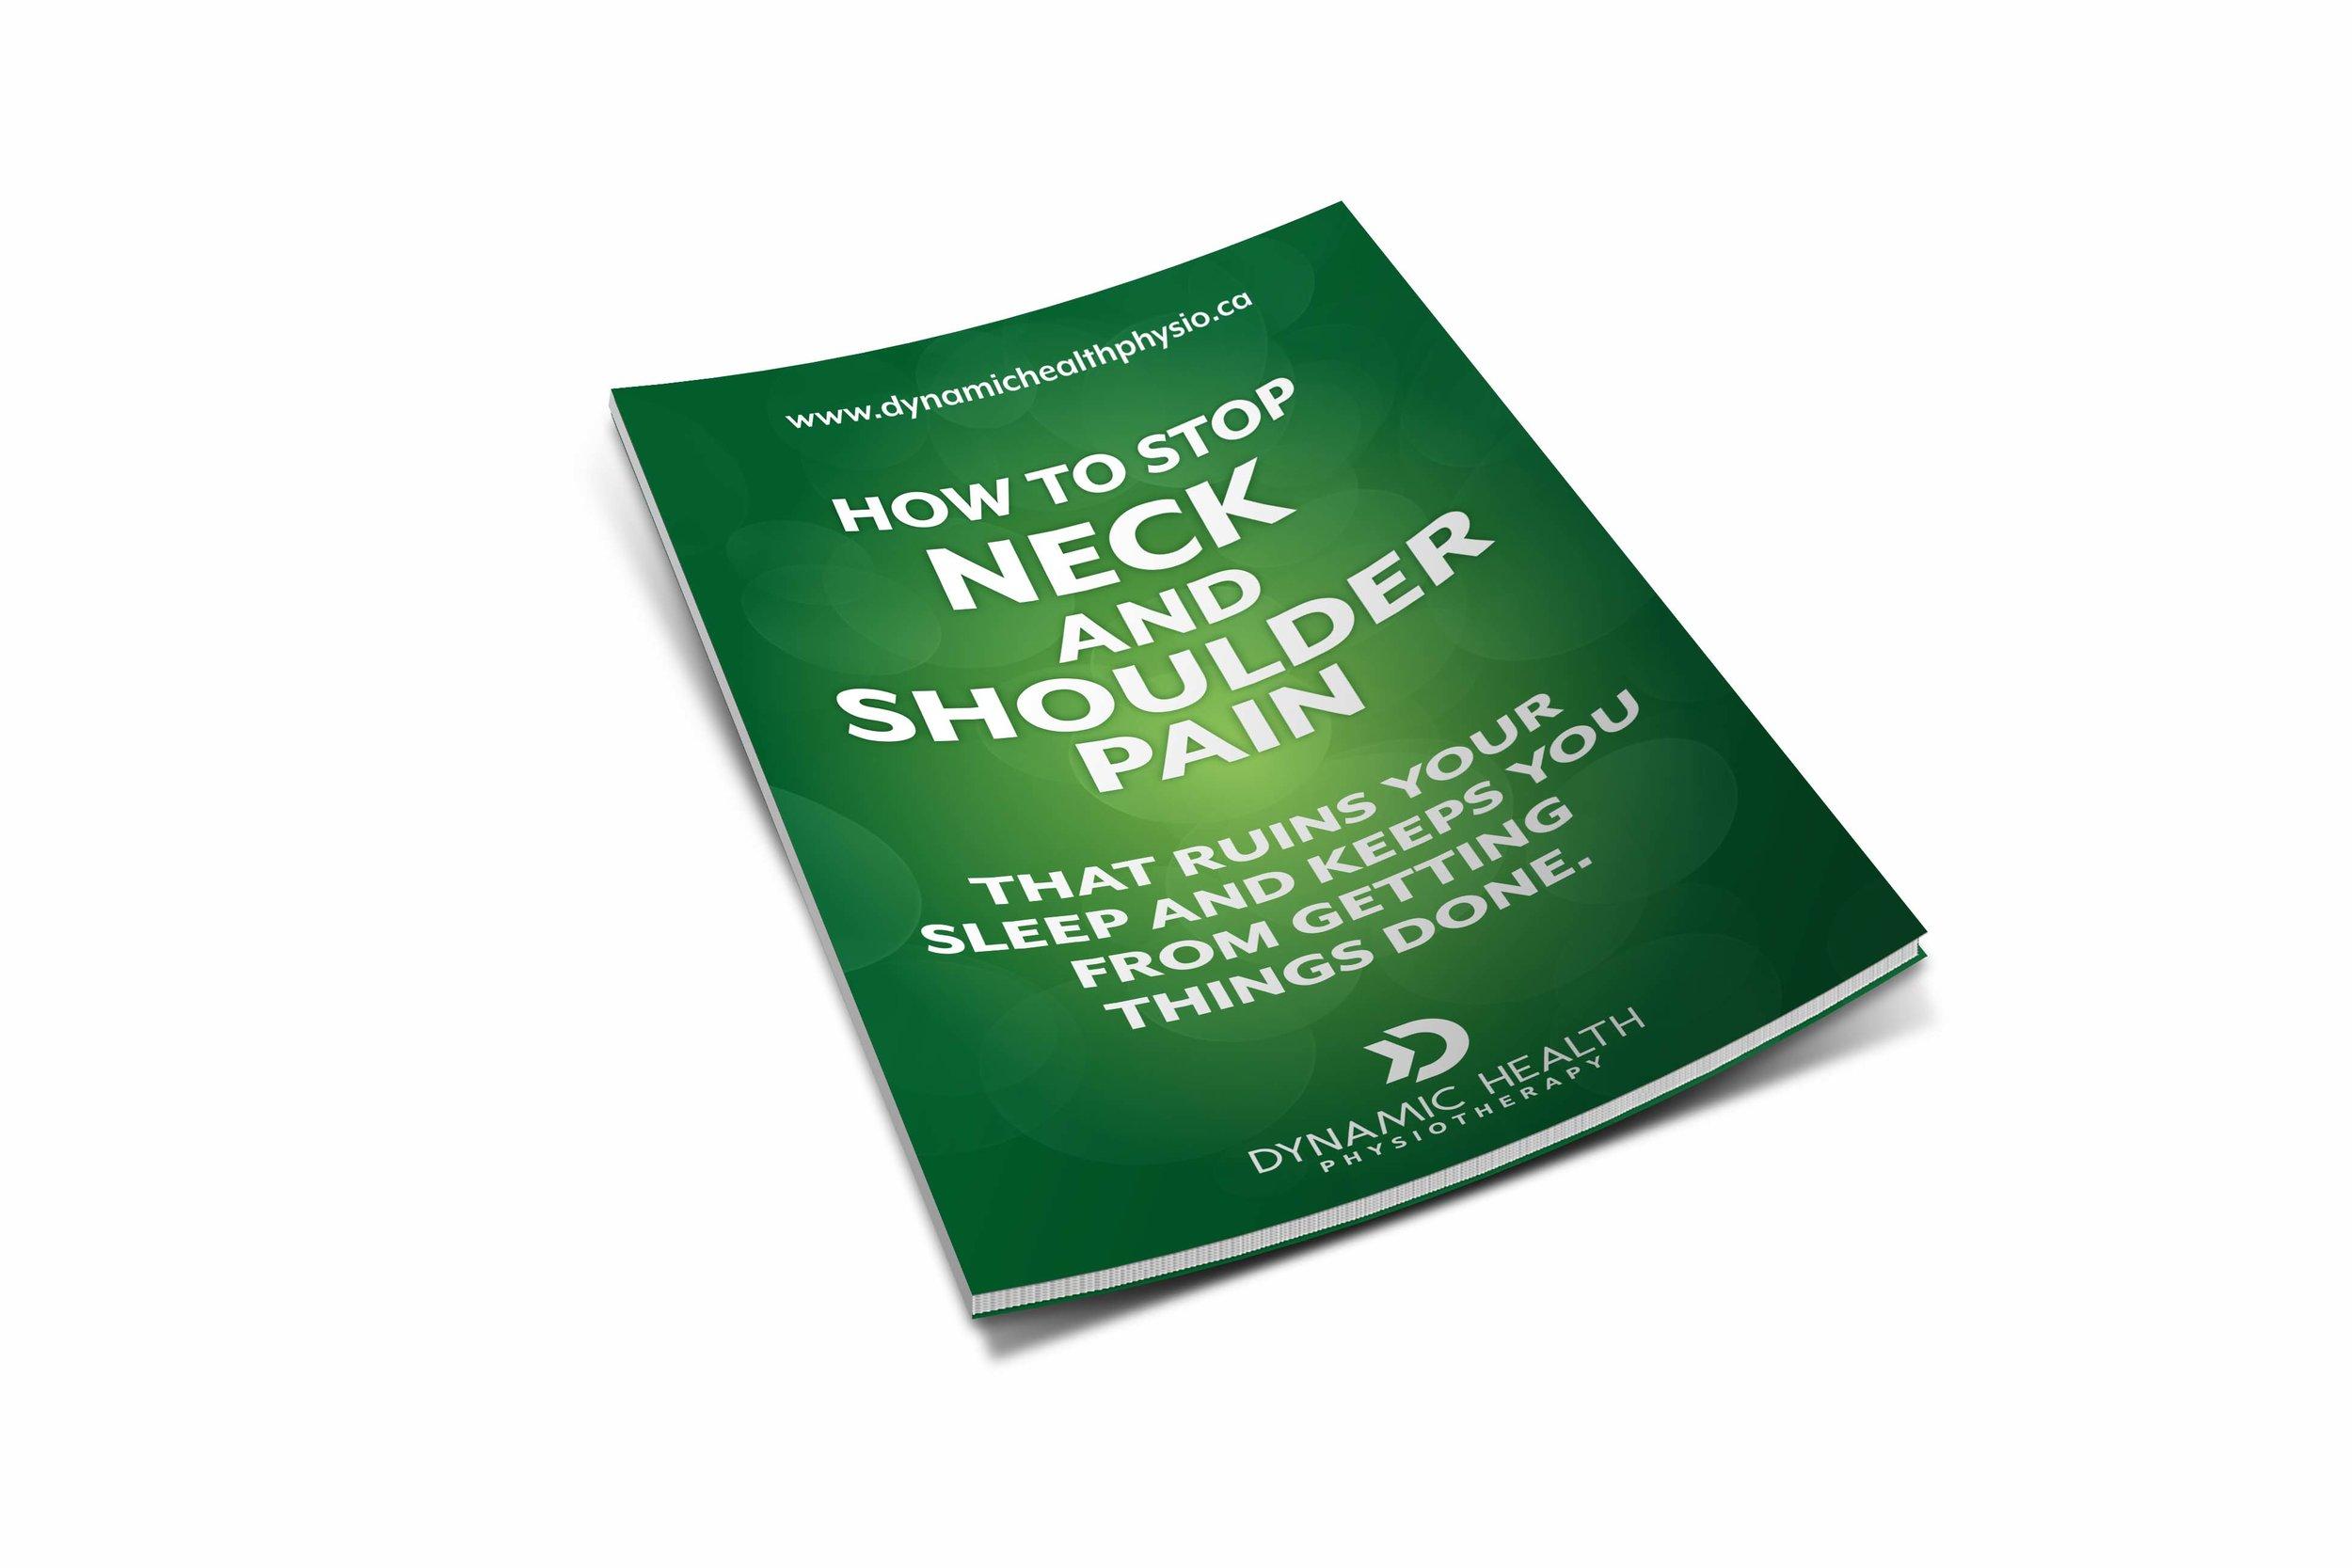 Neck/Shoulder Pain